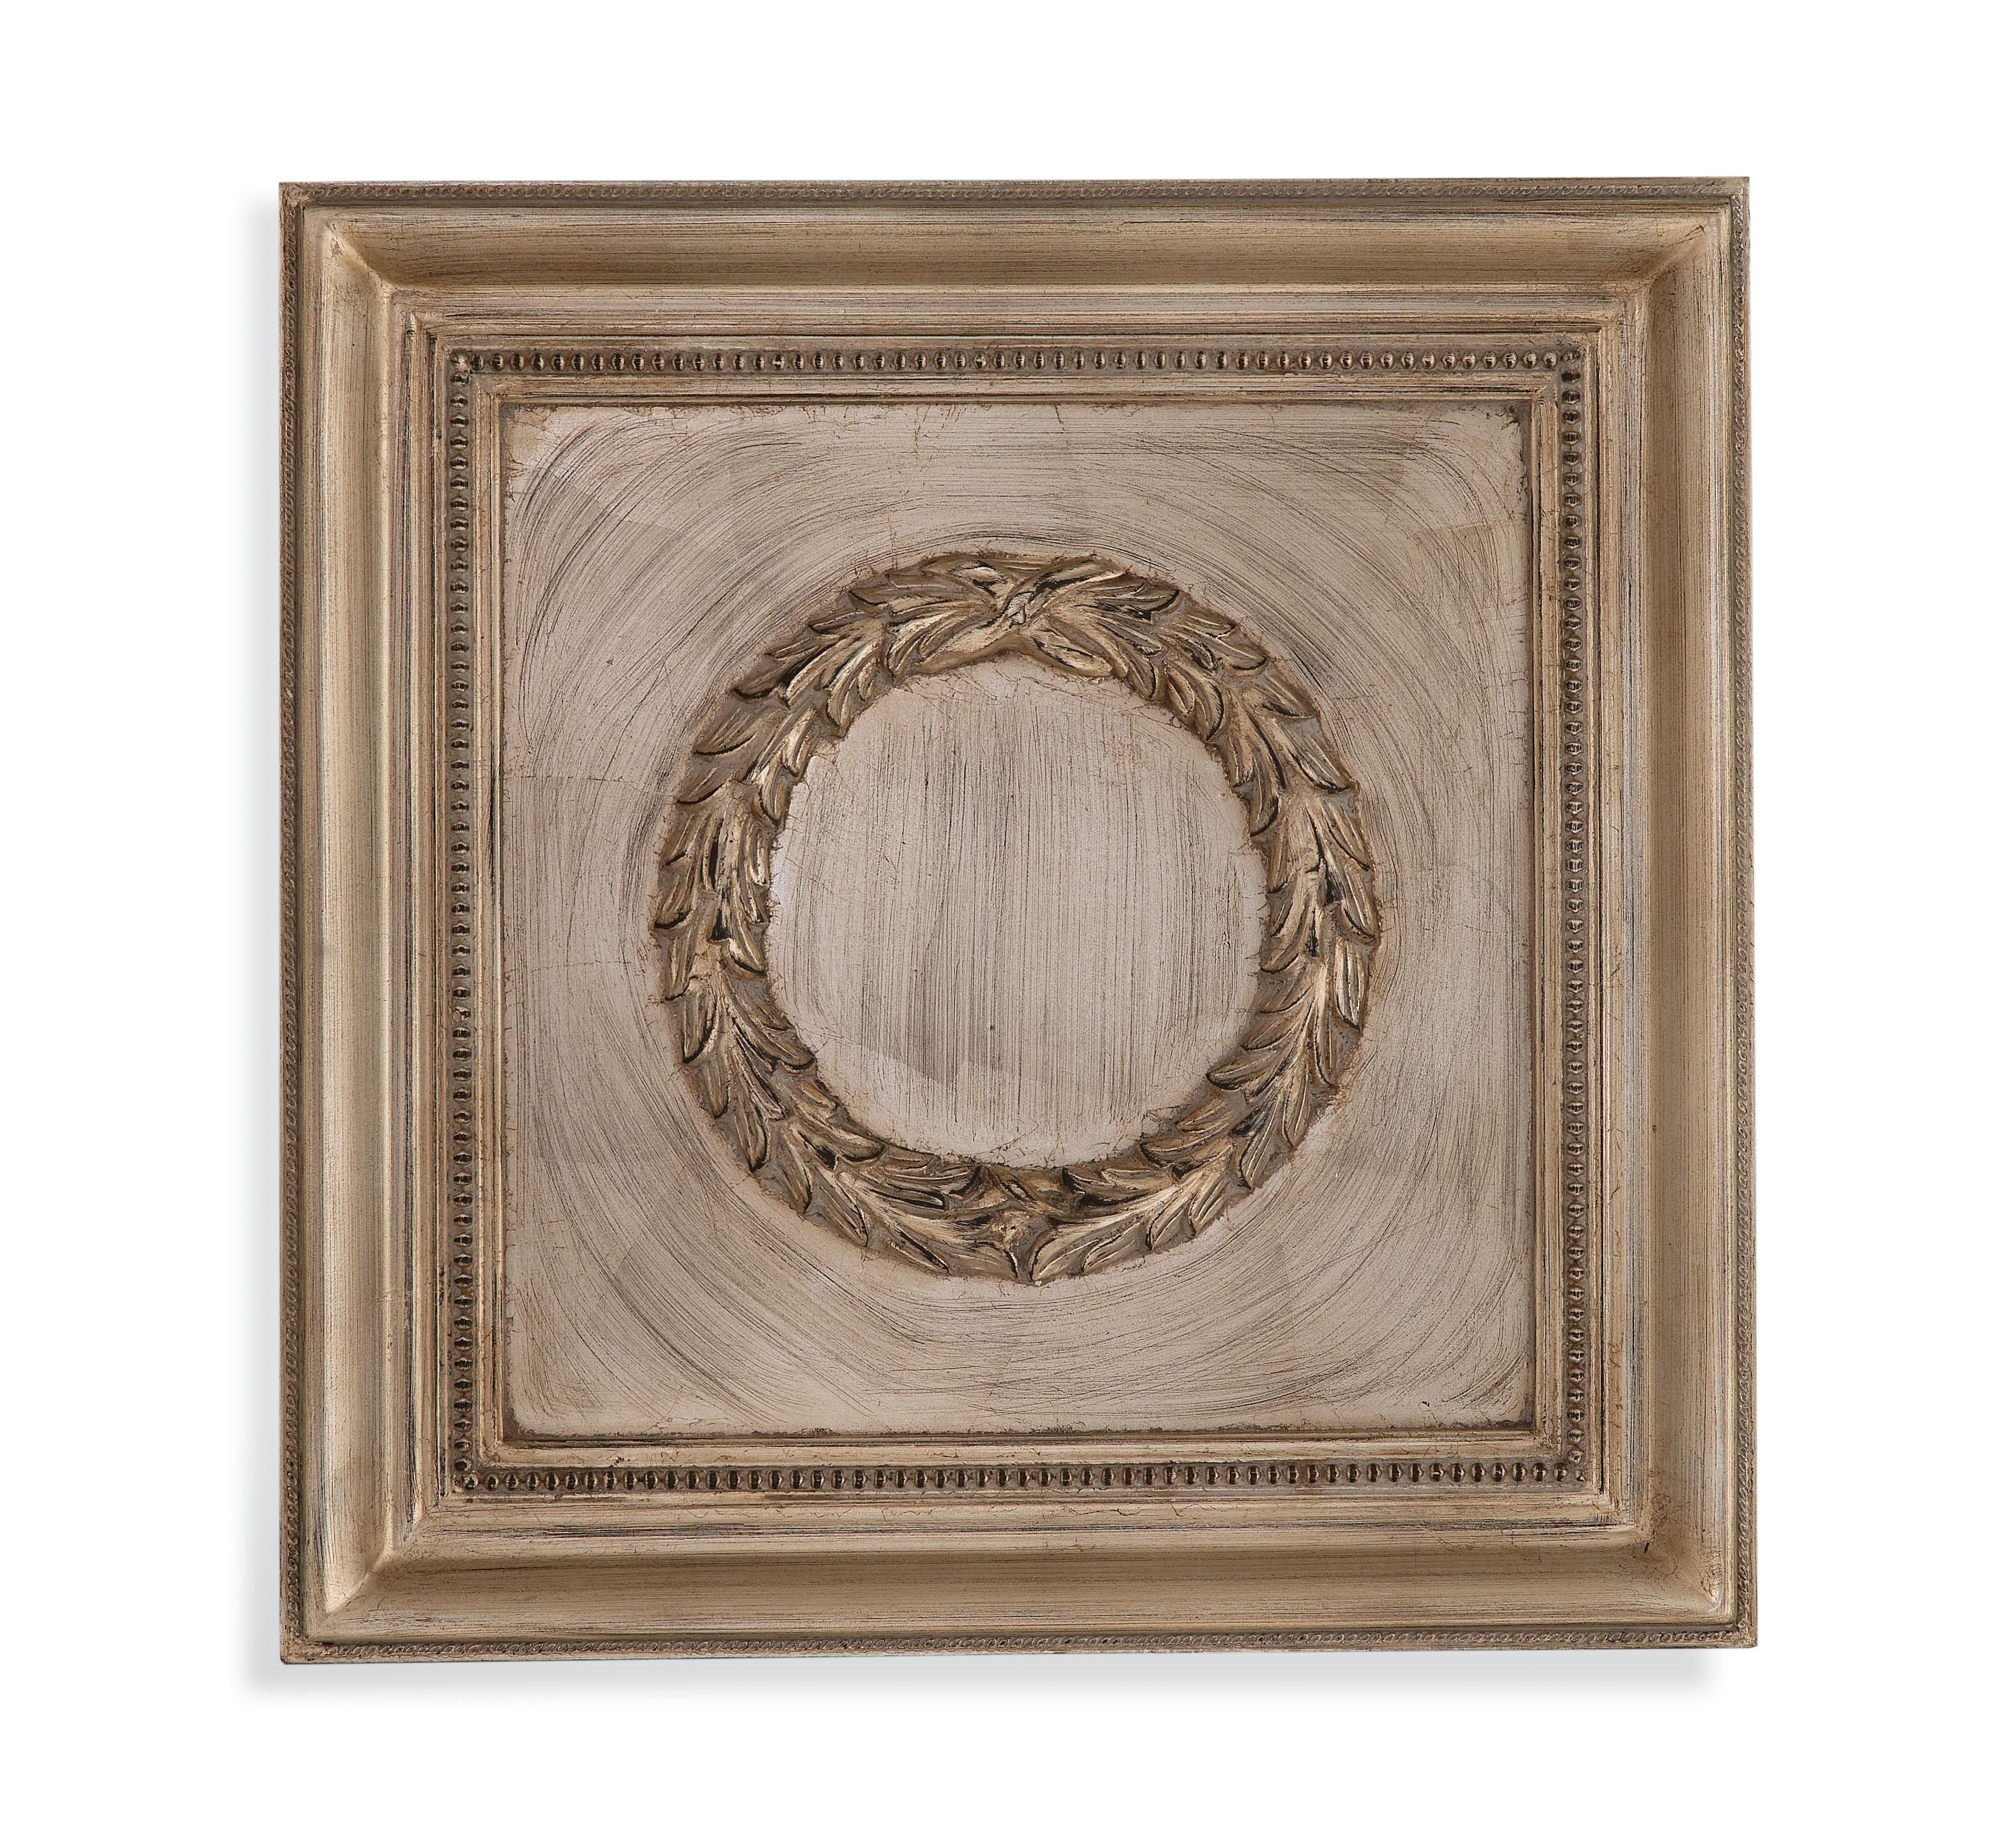 Hollywood Glam Laurel Wreath Wall Medallion by Bassett Mirror at Alison Craig Home Furnishings